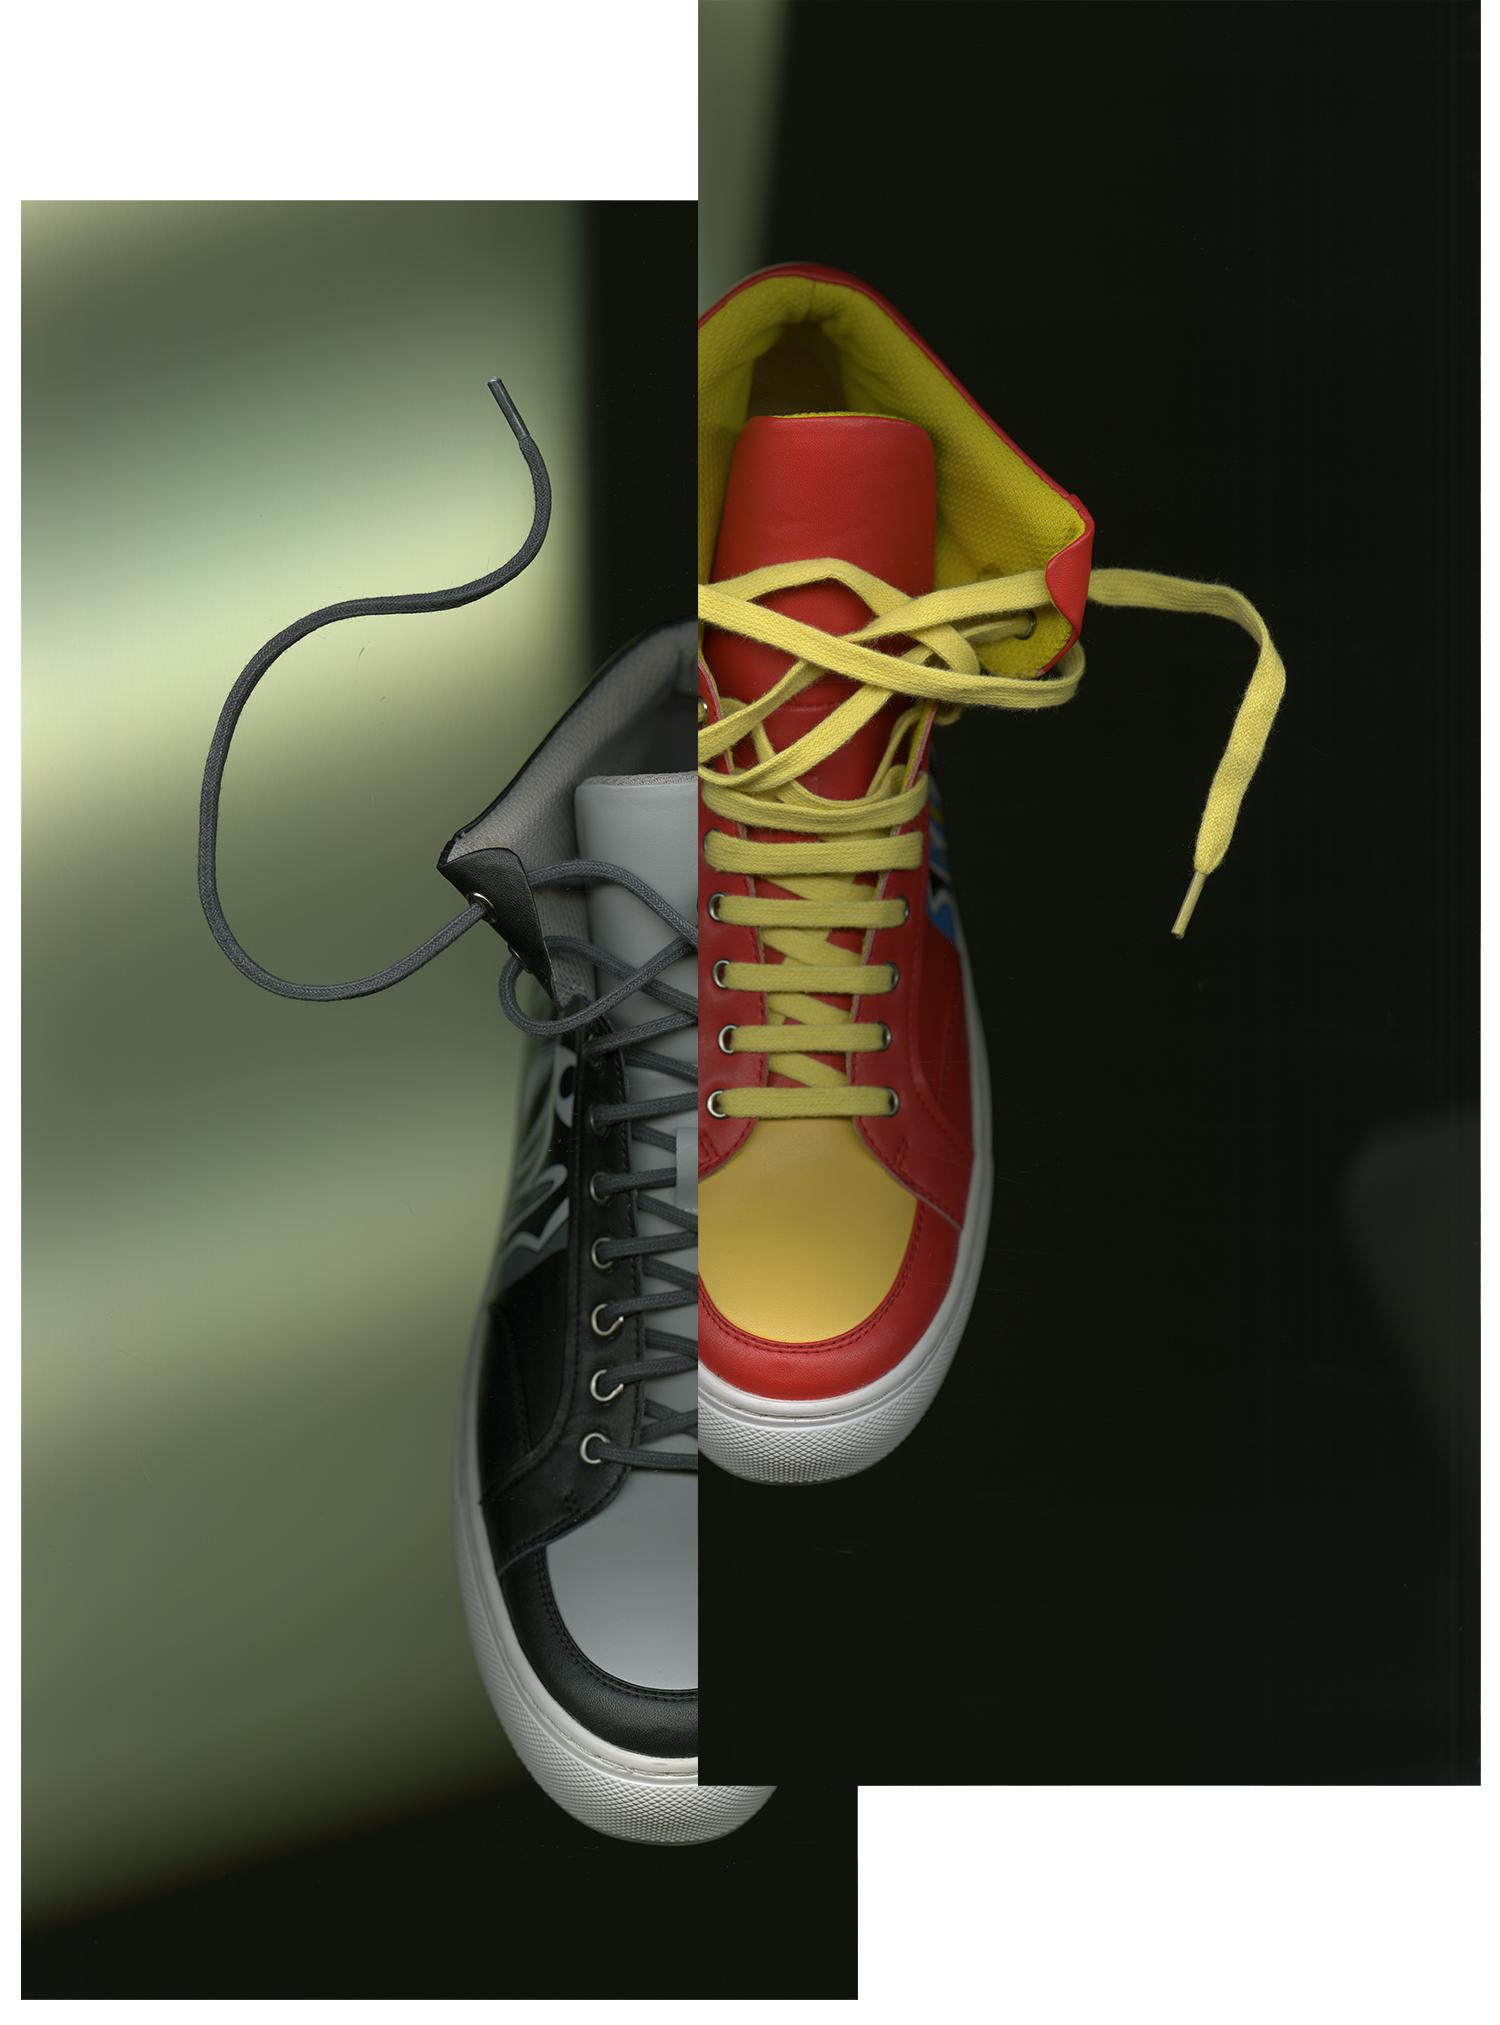 Shoes designed by Shih Kai Tai, MFA Fashion Merchandising